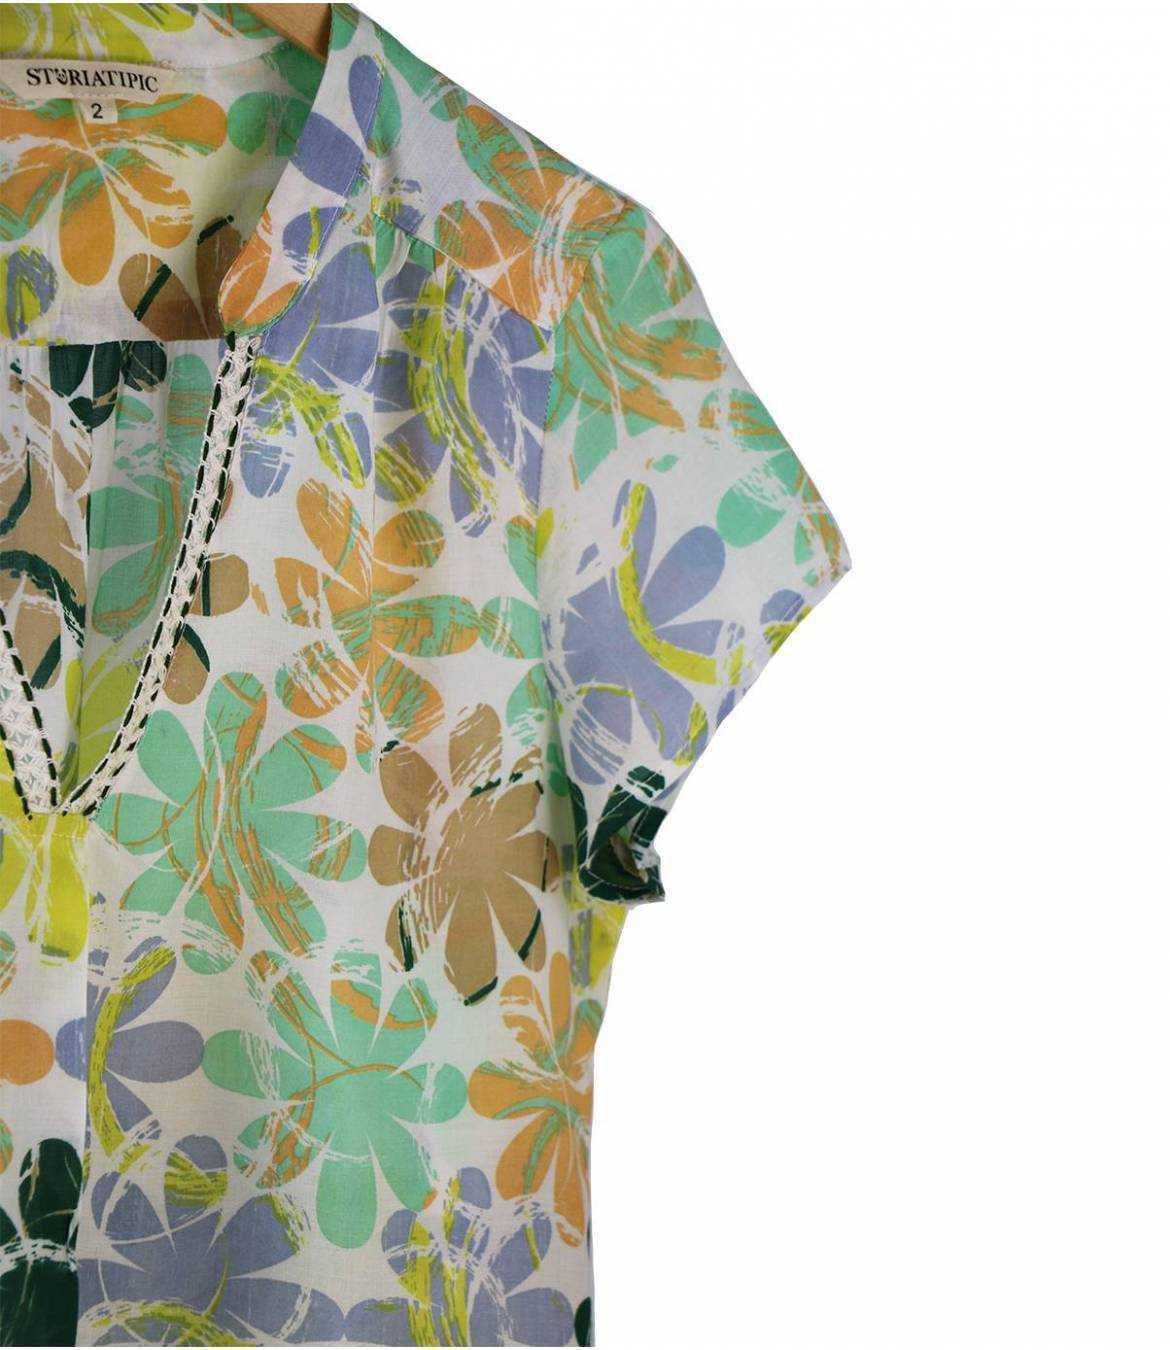 ZOE ELLY Women's Modal T-shirt Storiatipic - 6